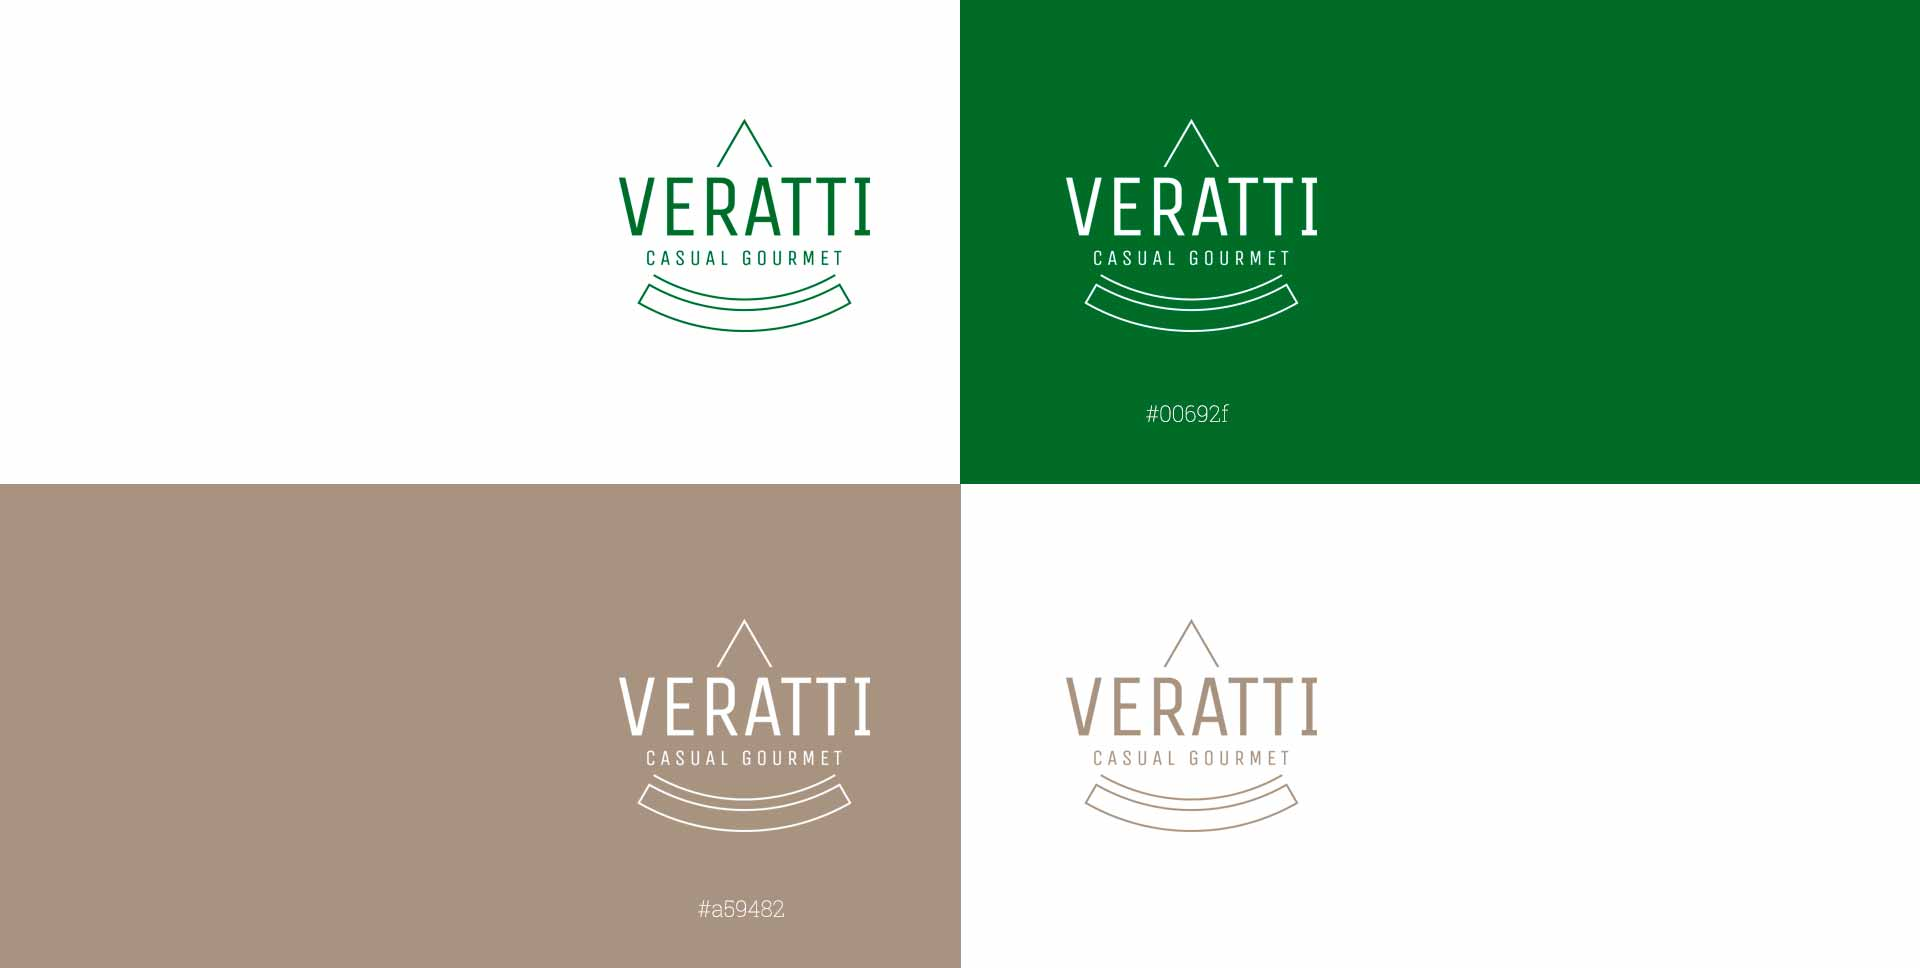 KFDS - Veratti Case Study Logo Palette